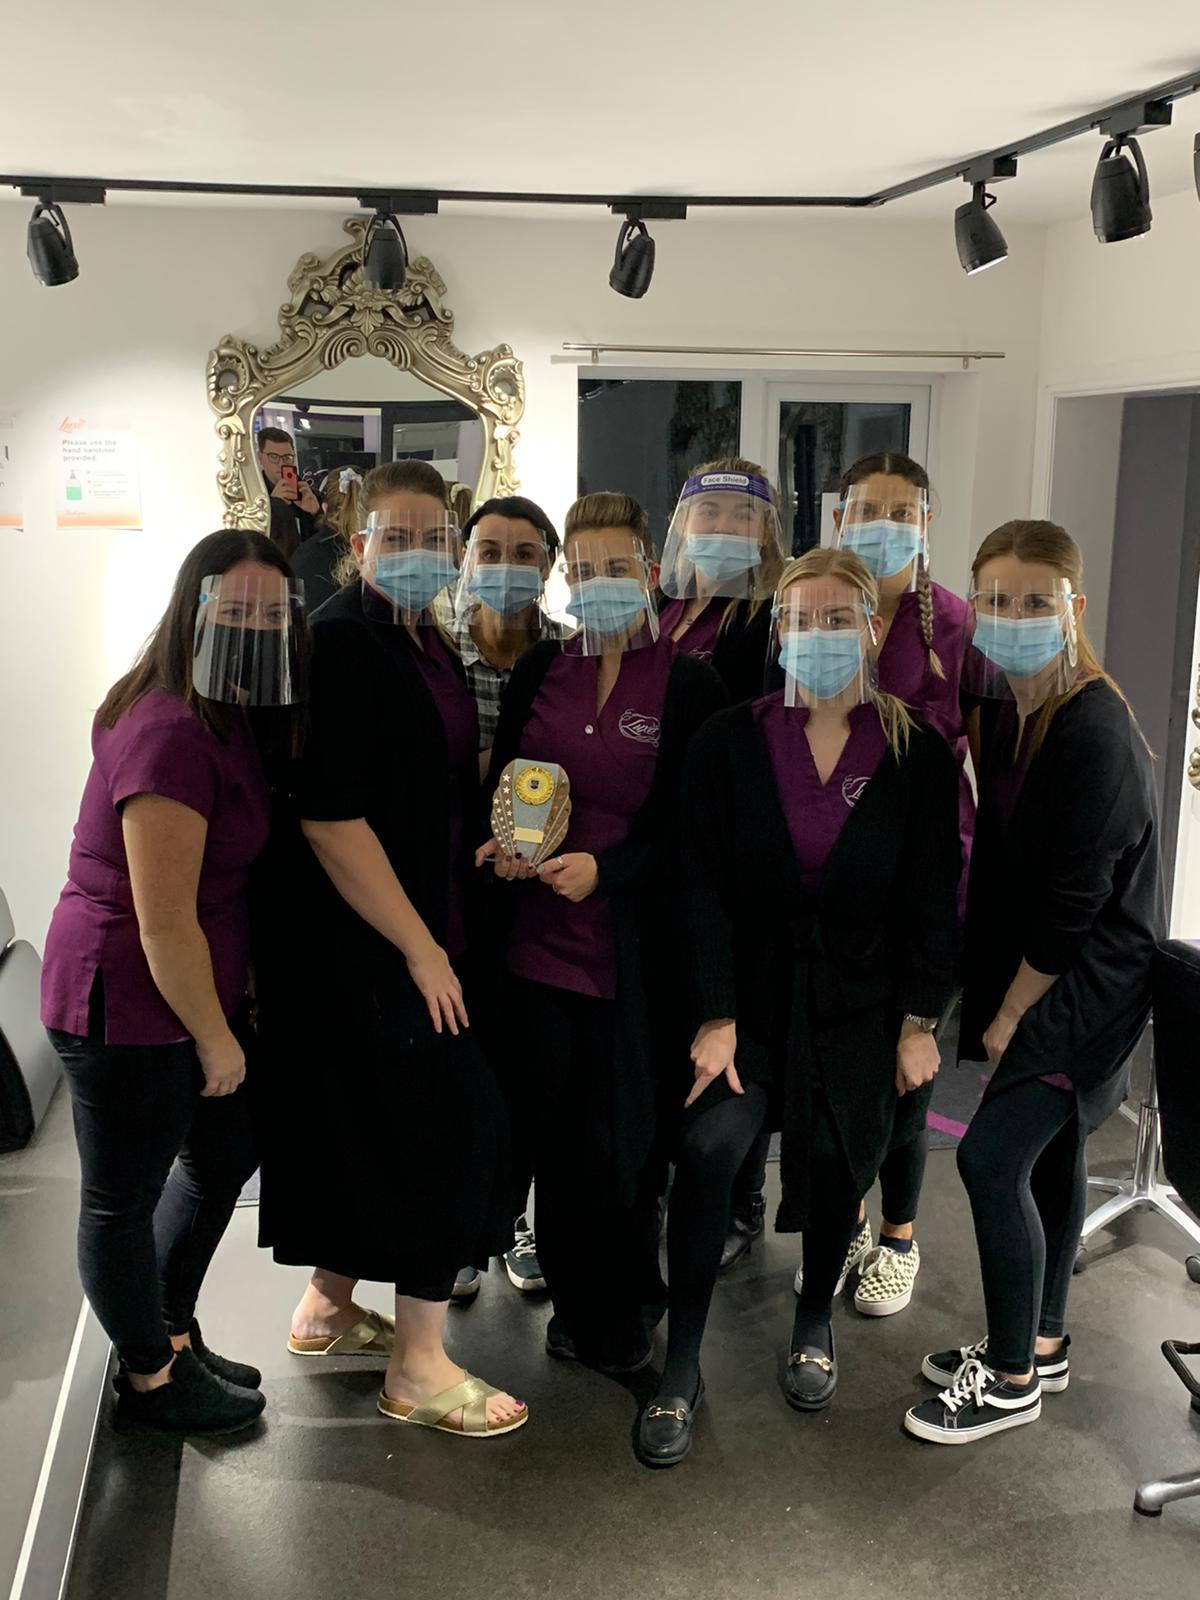 Luxe Salon in Buckley celebrates winning Hair Salon of the year award 2020